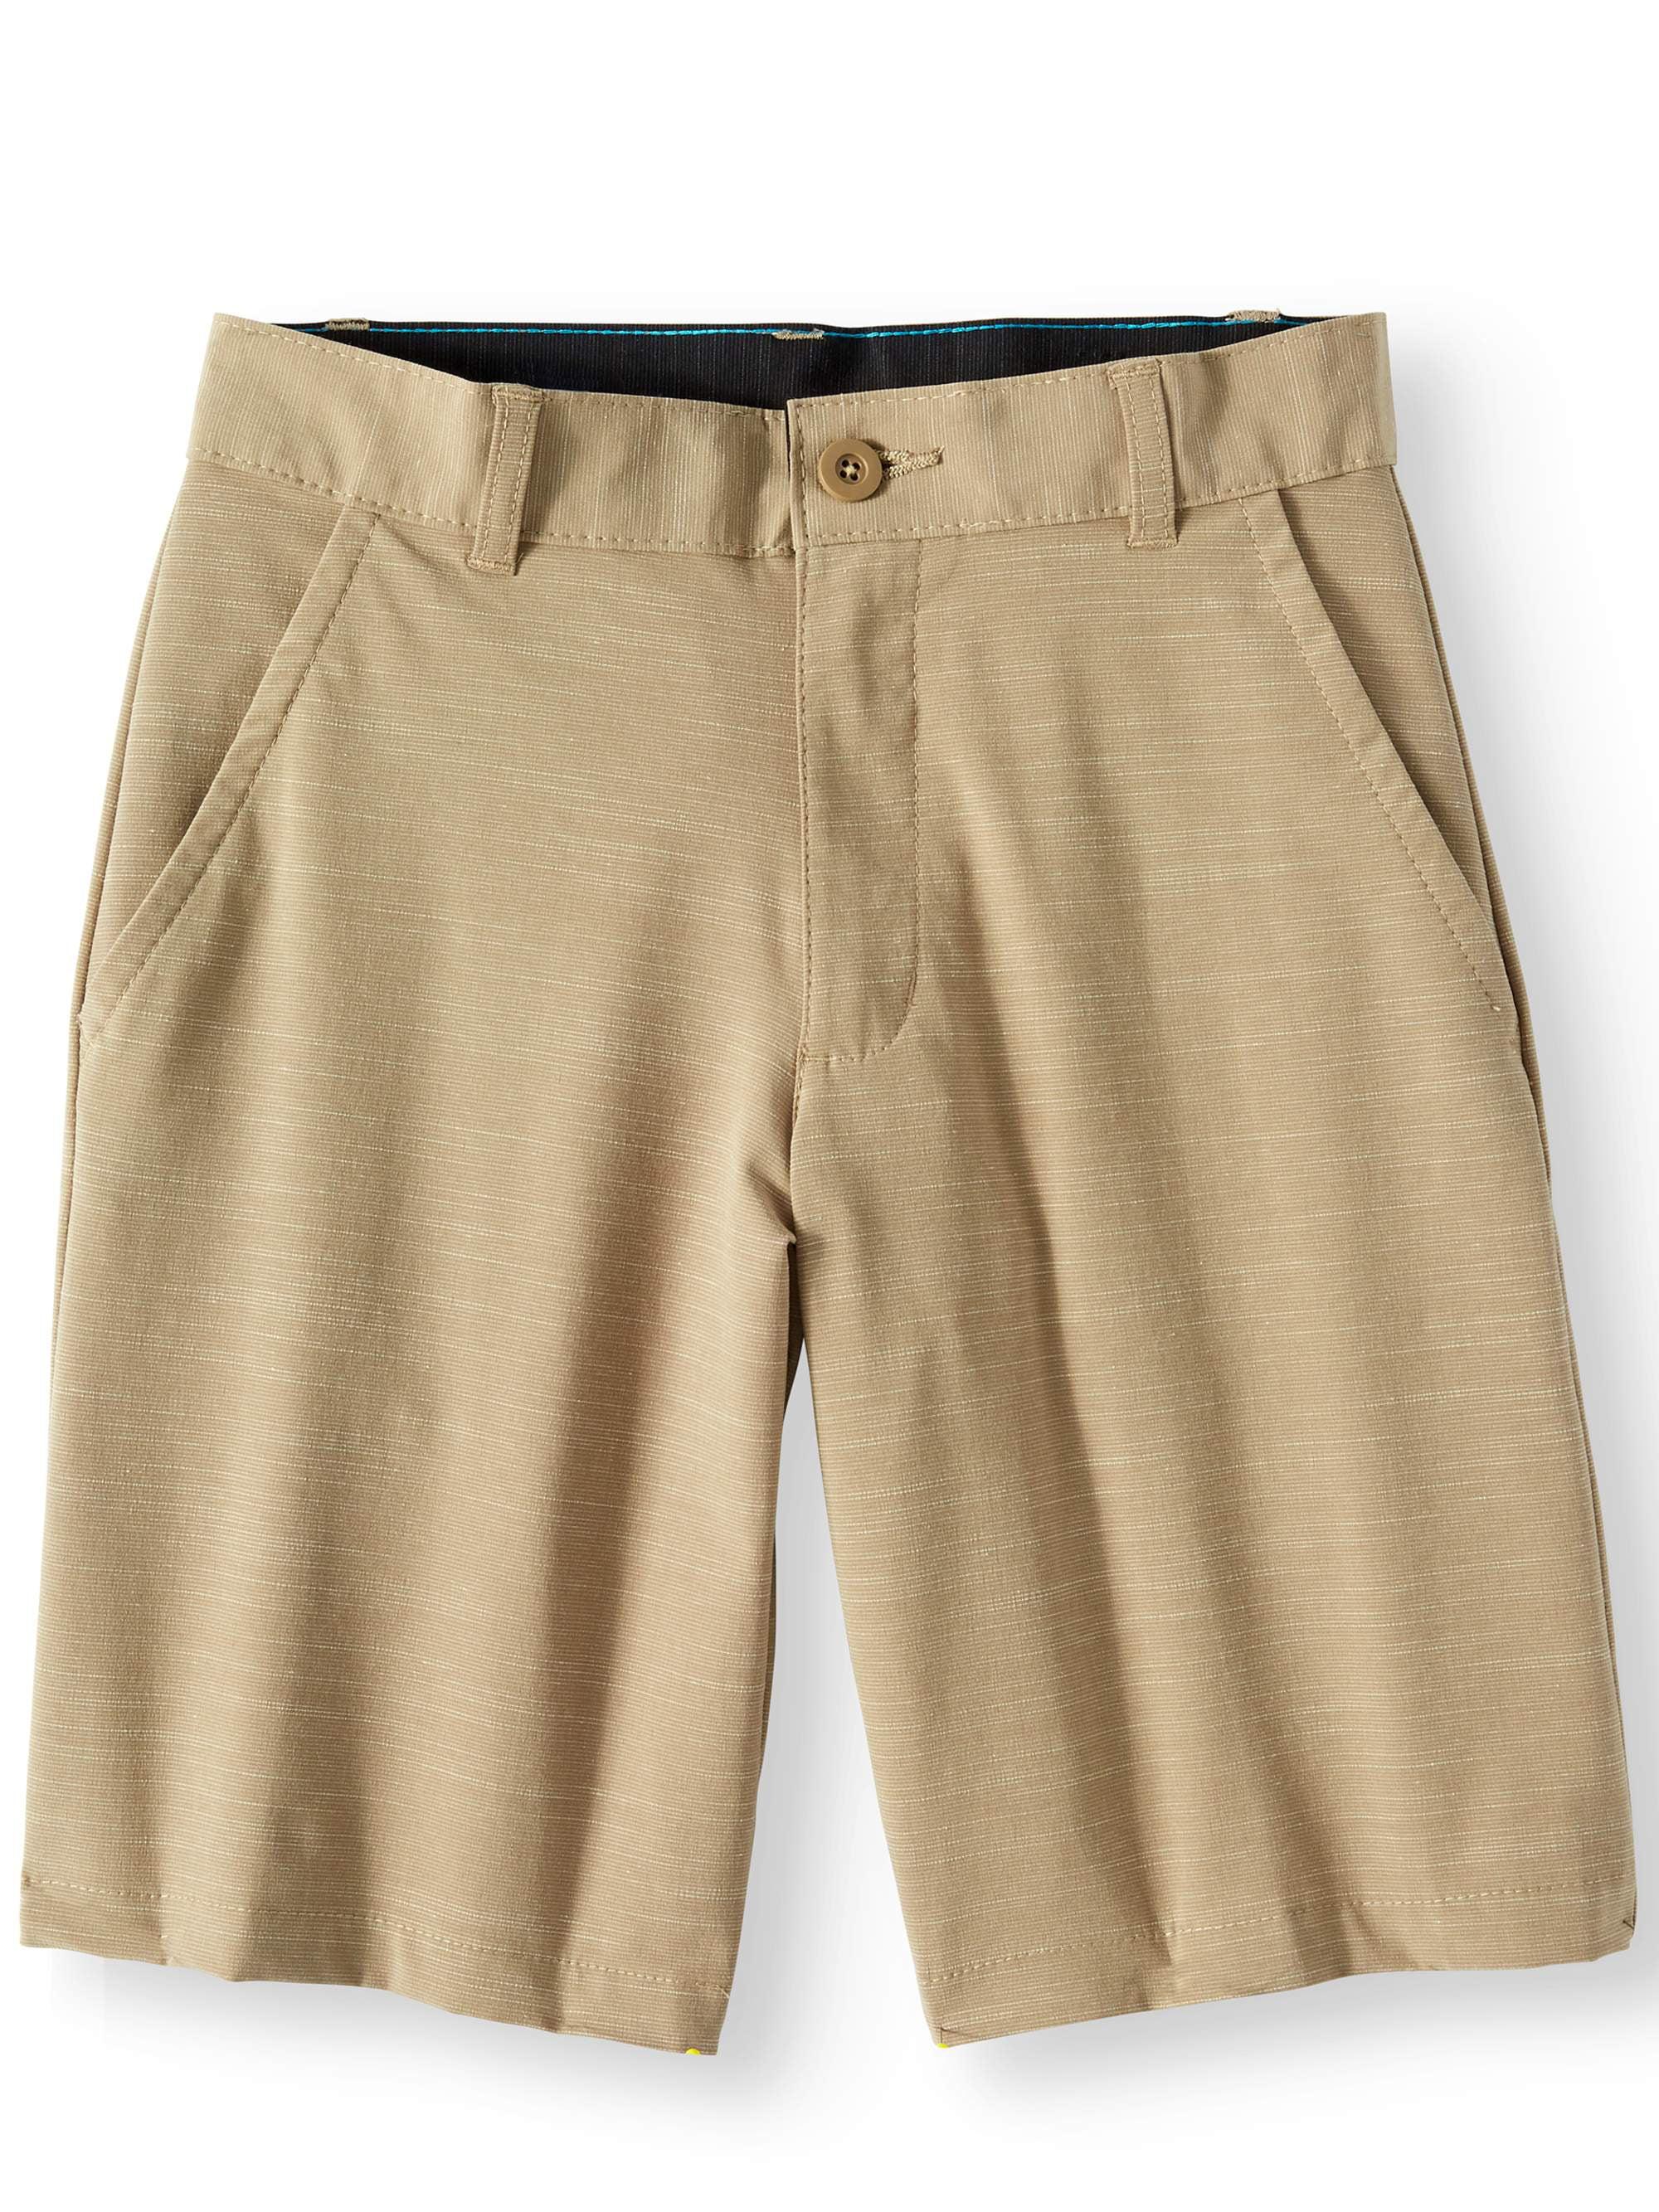 Hybrid Strech Quick Dry Shorts (Big Boys)